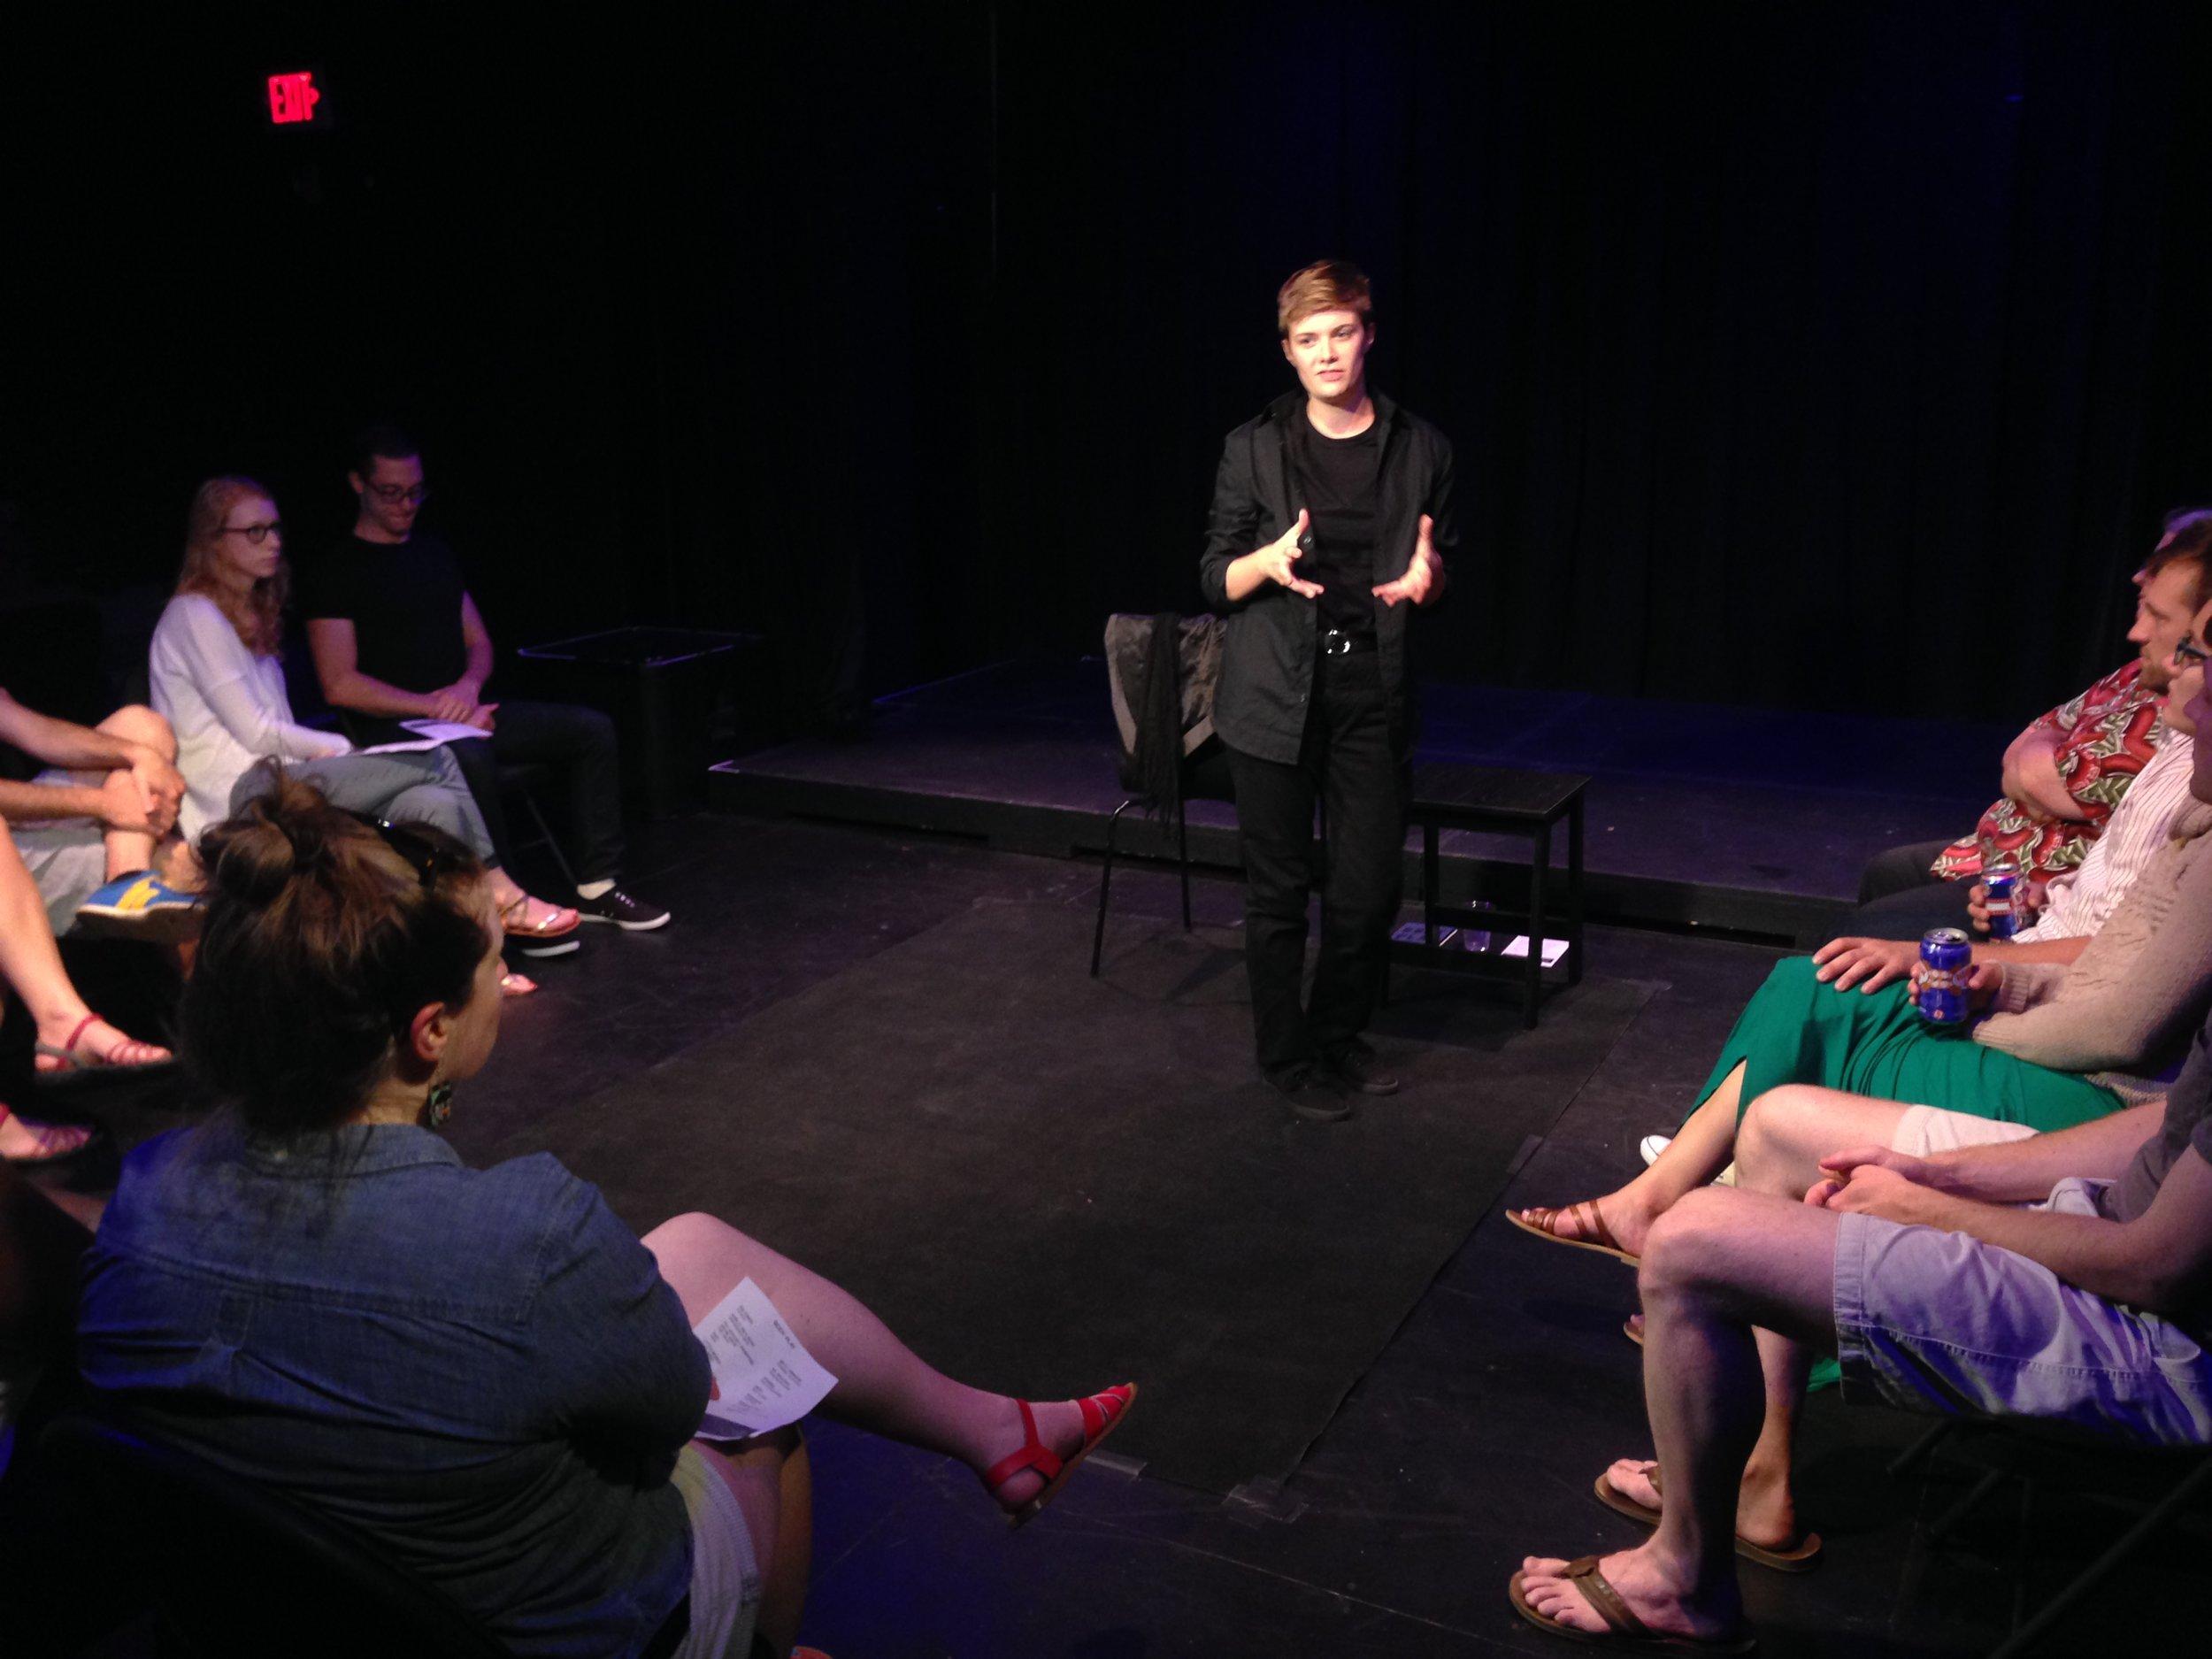 Kaycee Filson performs BODY Play at the Davis Square Theatre, Boston, MA, 2015